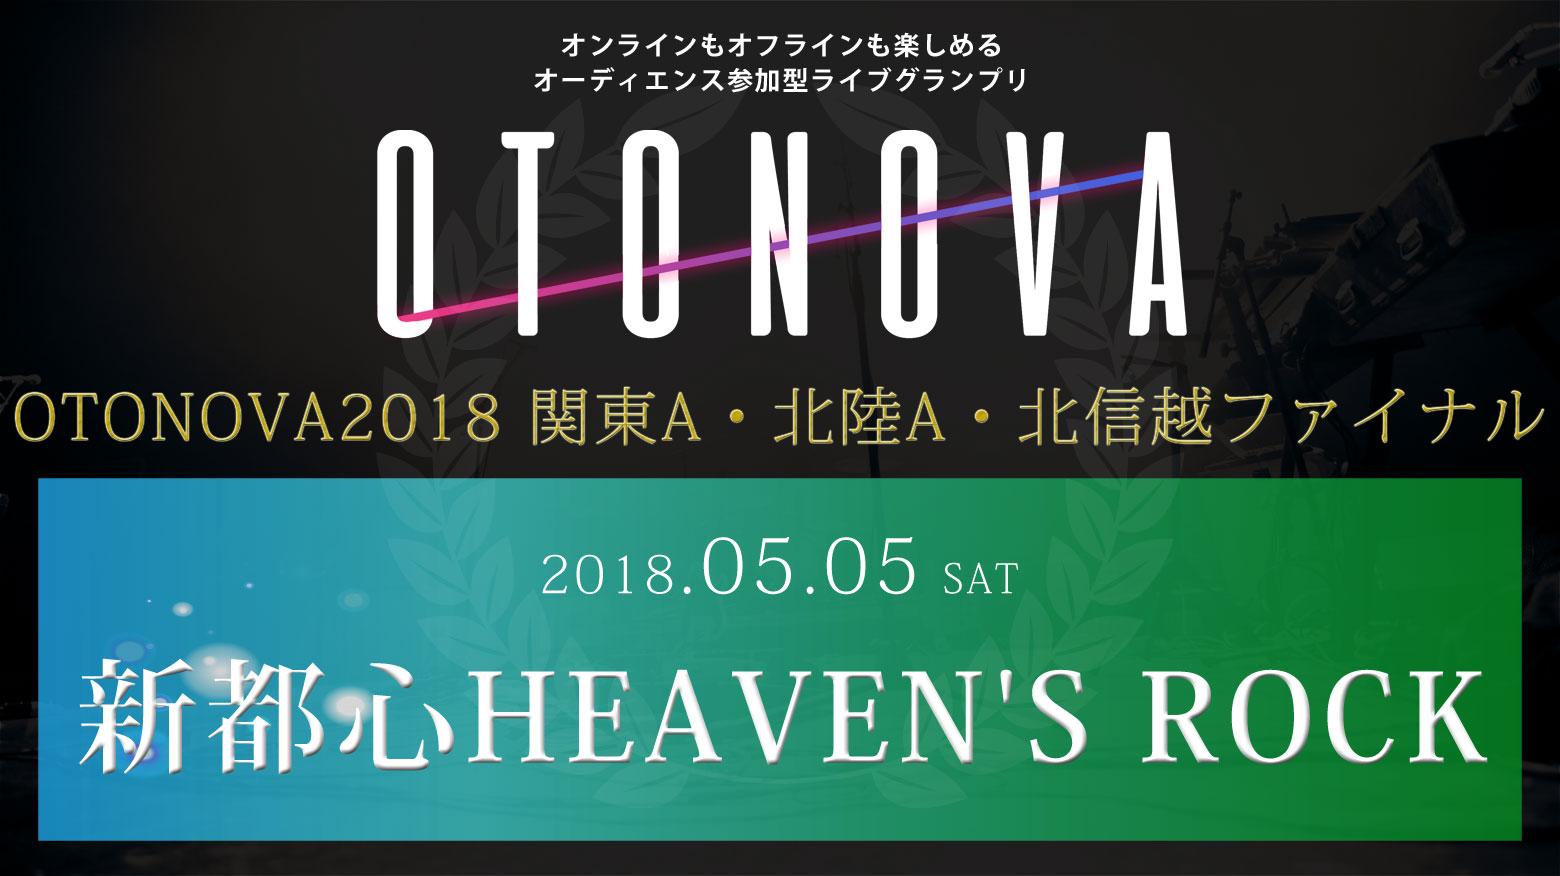 OTONOVA2018「関東A・北陸A・北信越ファイナル」